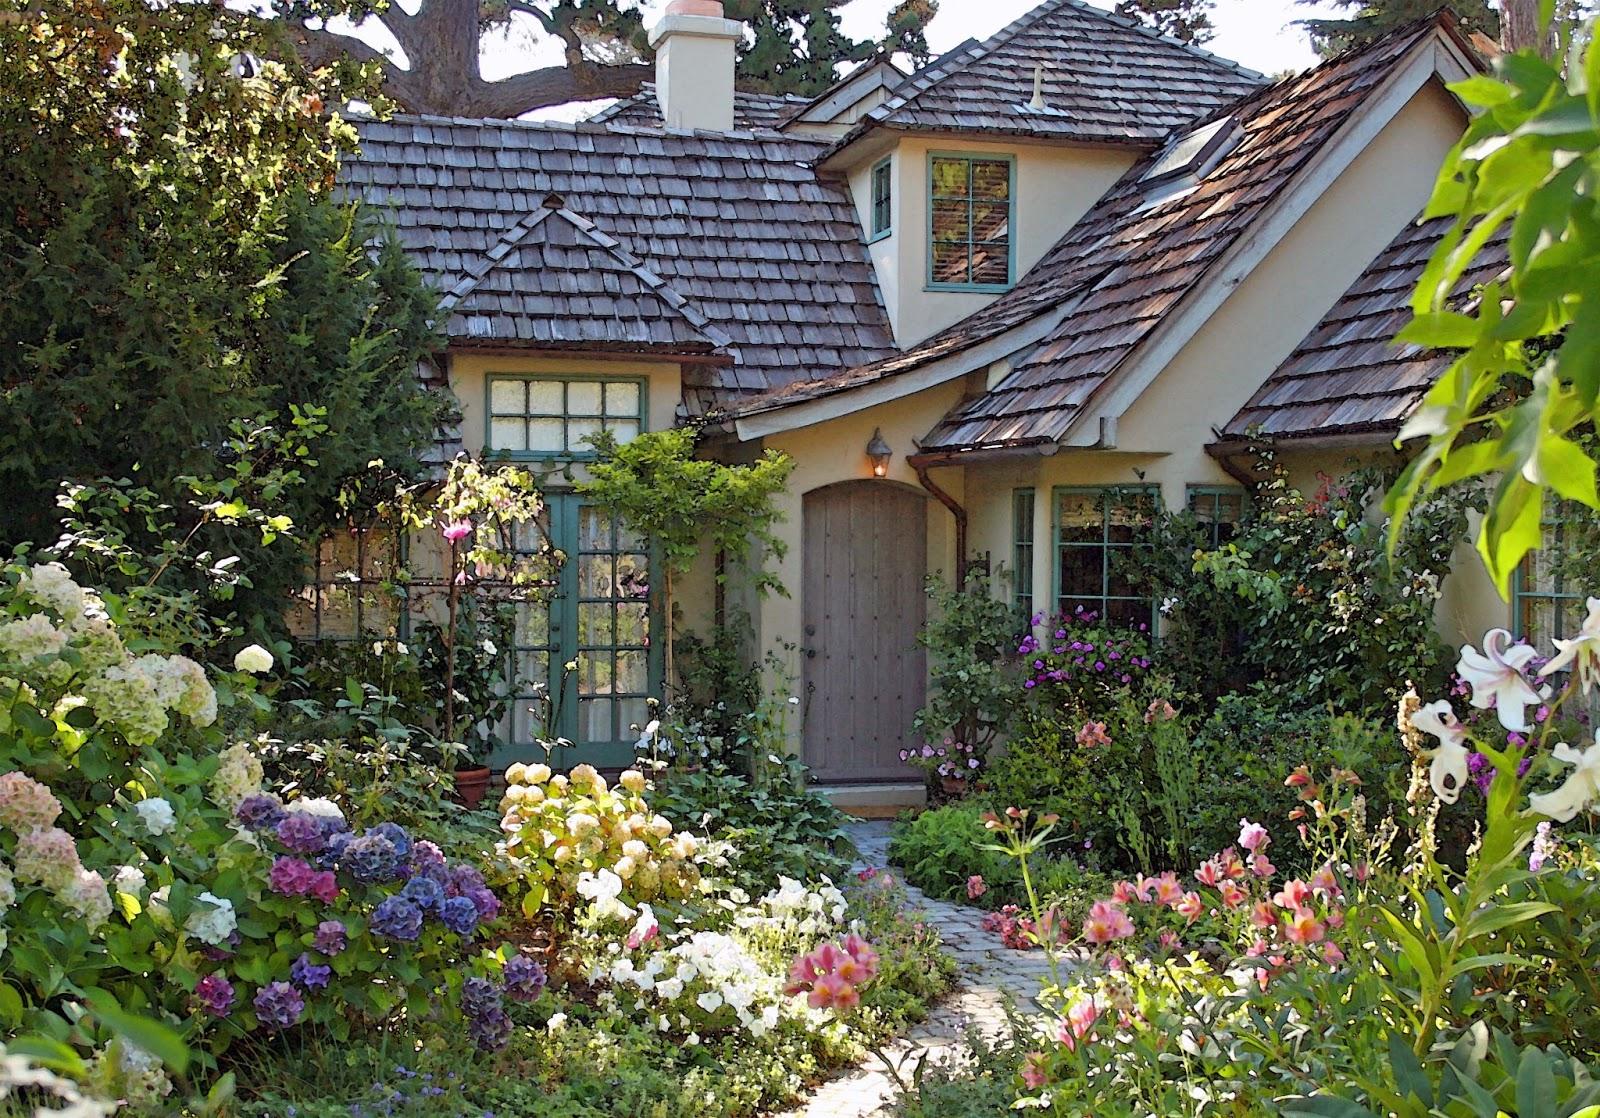 Cottage Gardens: The Singing Gardener: My Inspiration